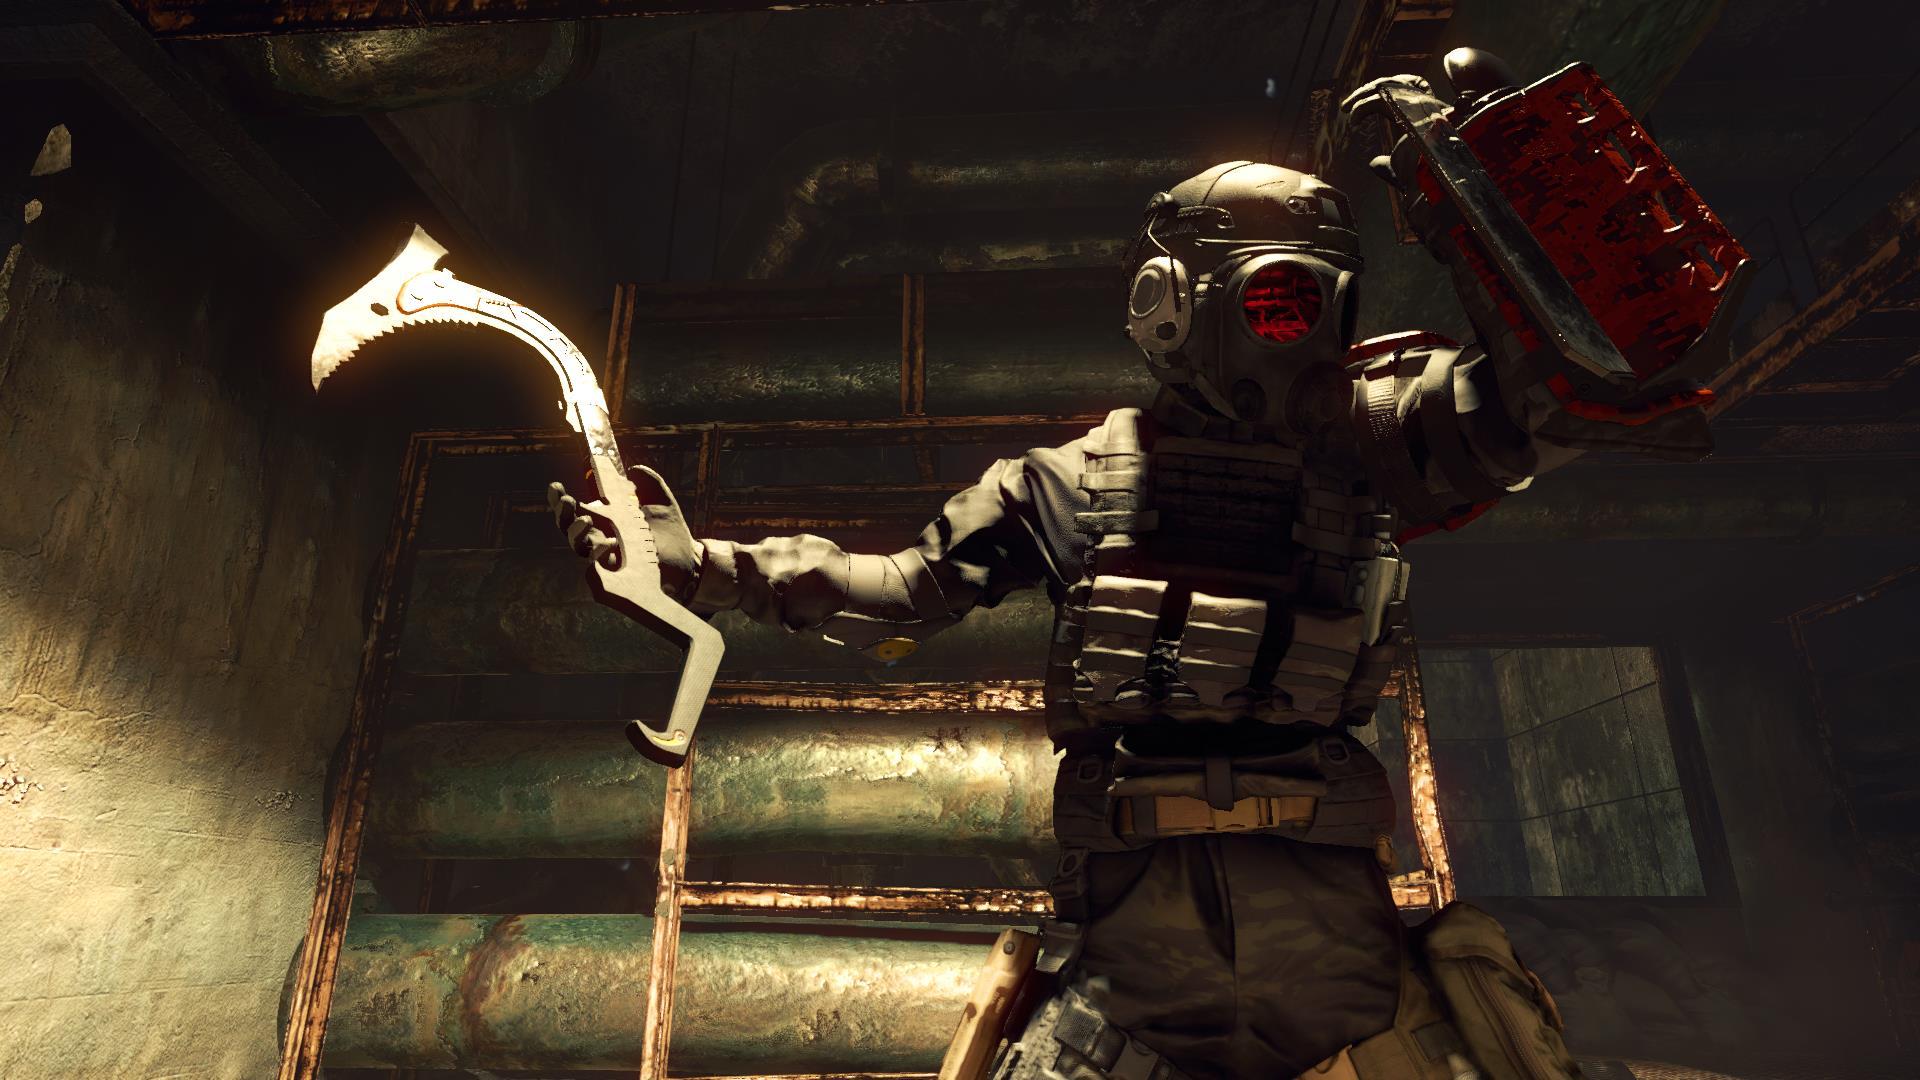 resident_evil_umbrella_corps_gameplay_1